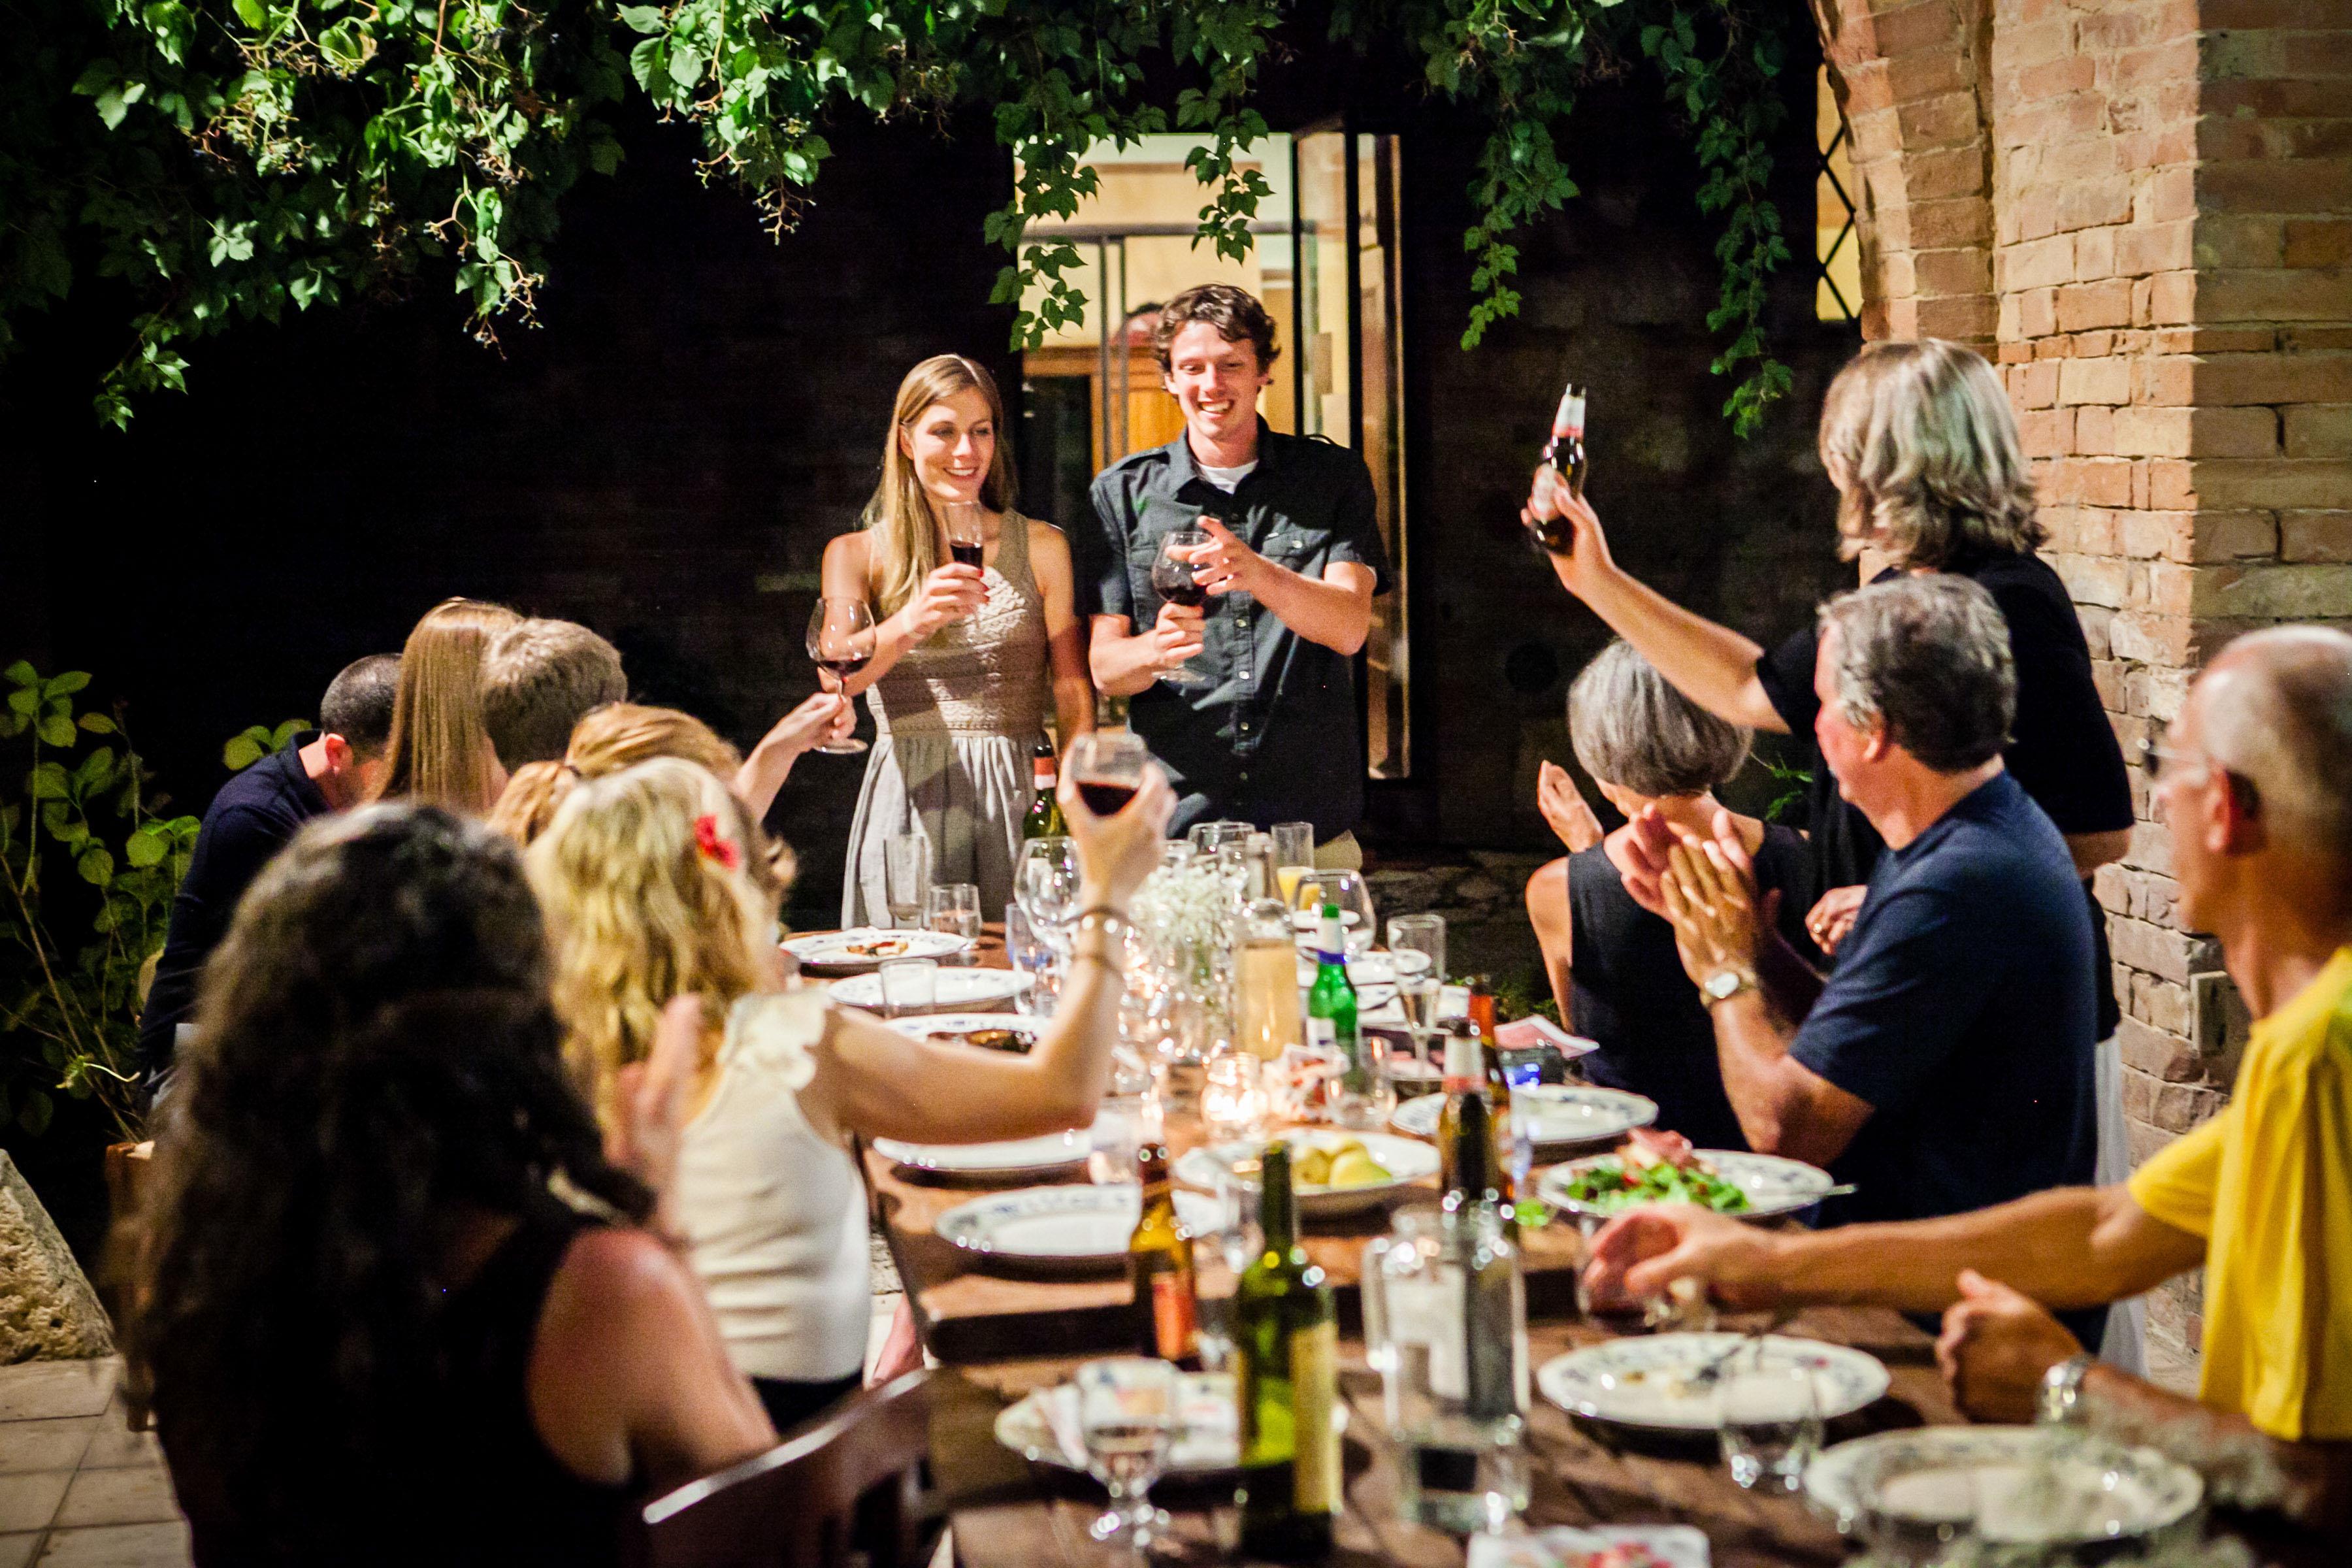 tuscany-wedding-reception-1.jpg